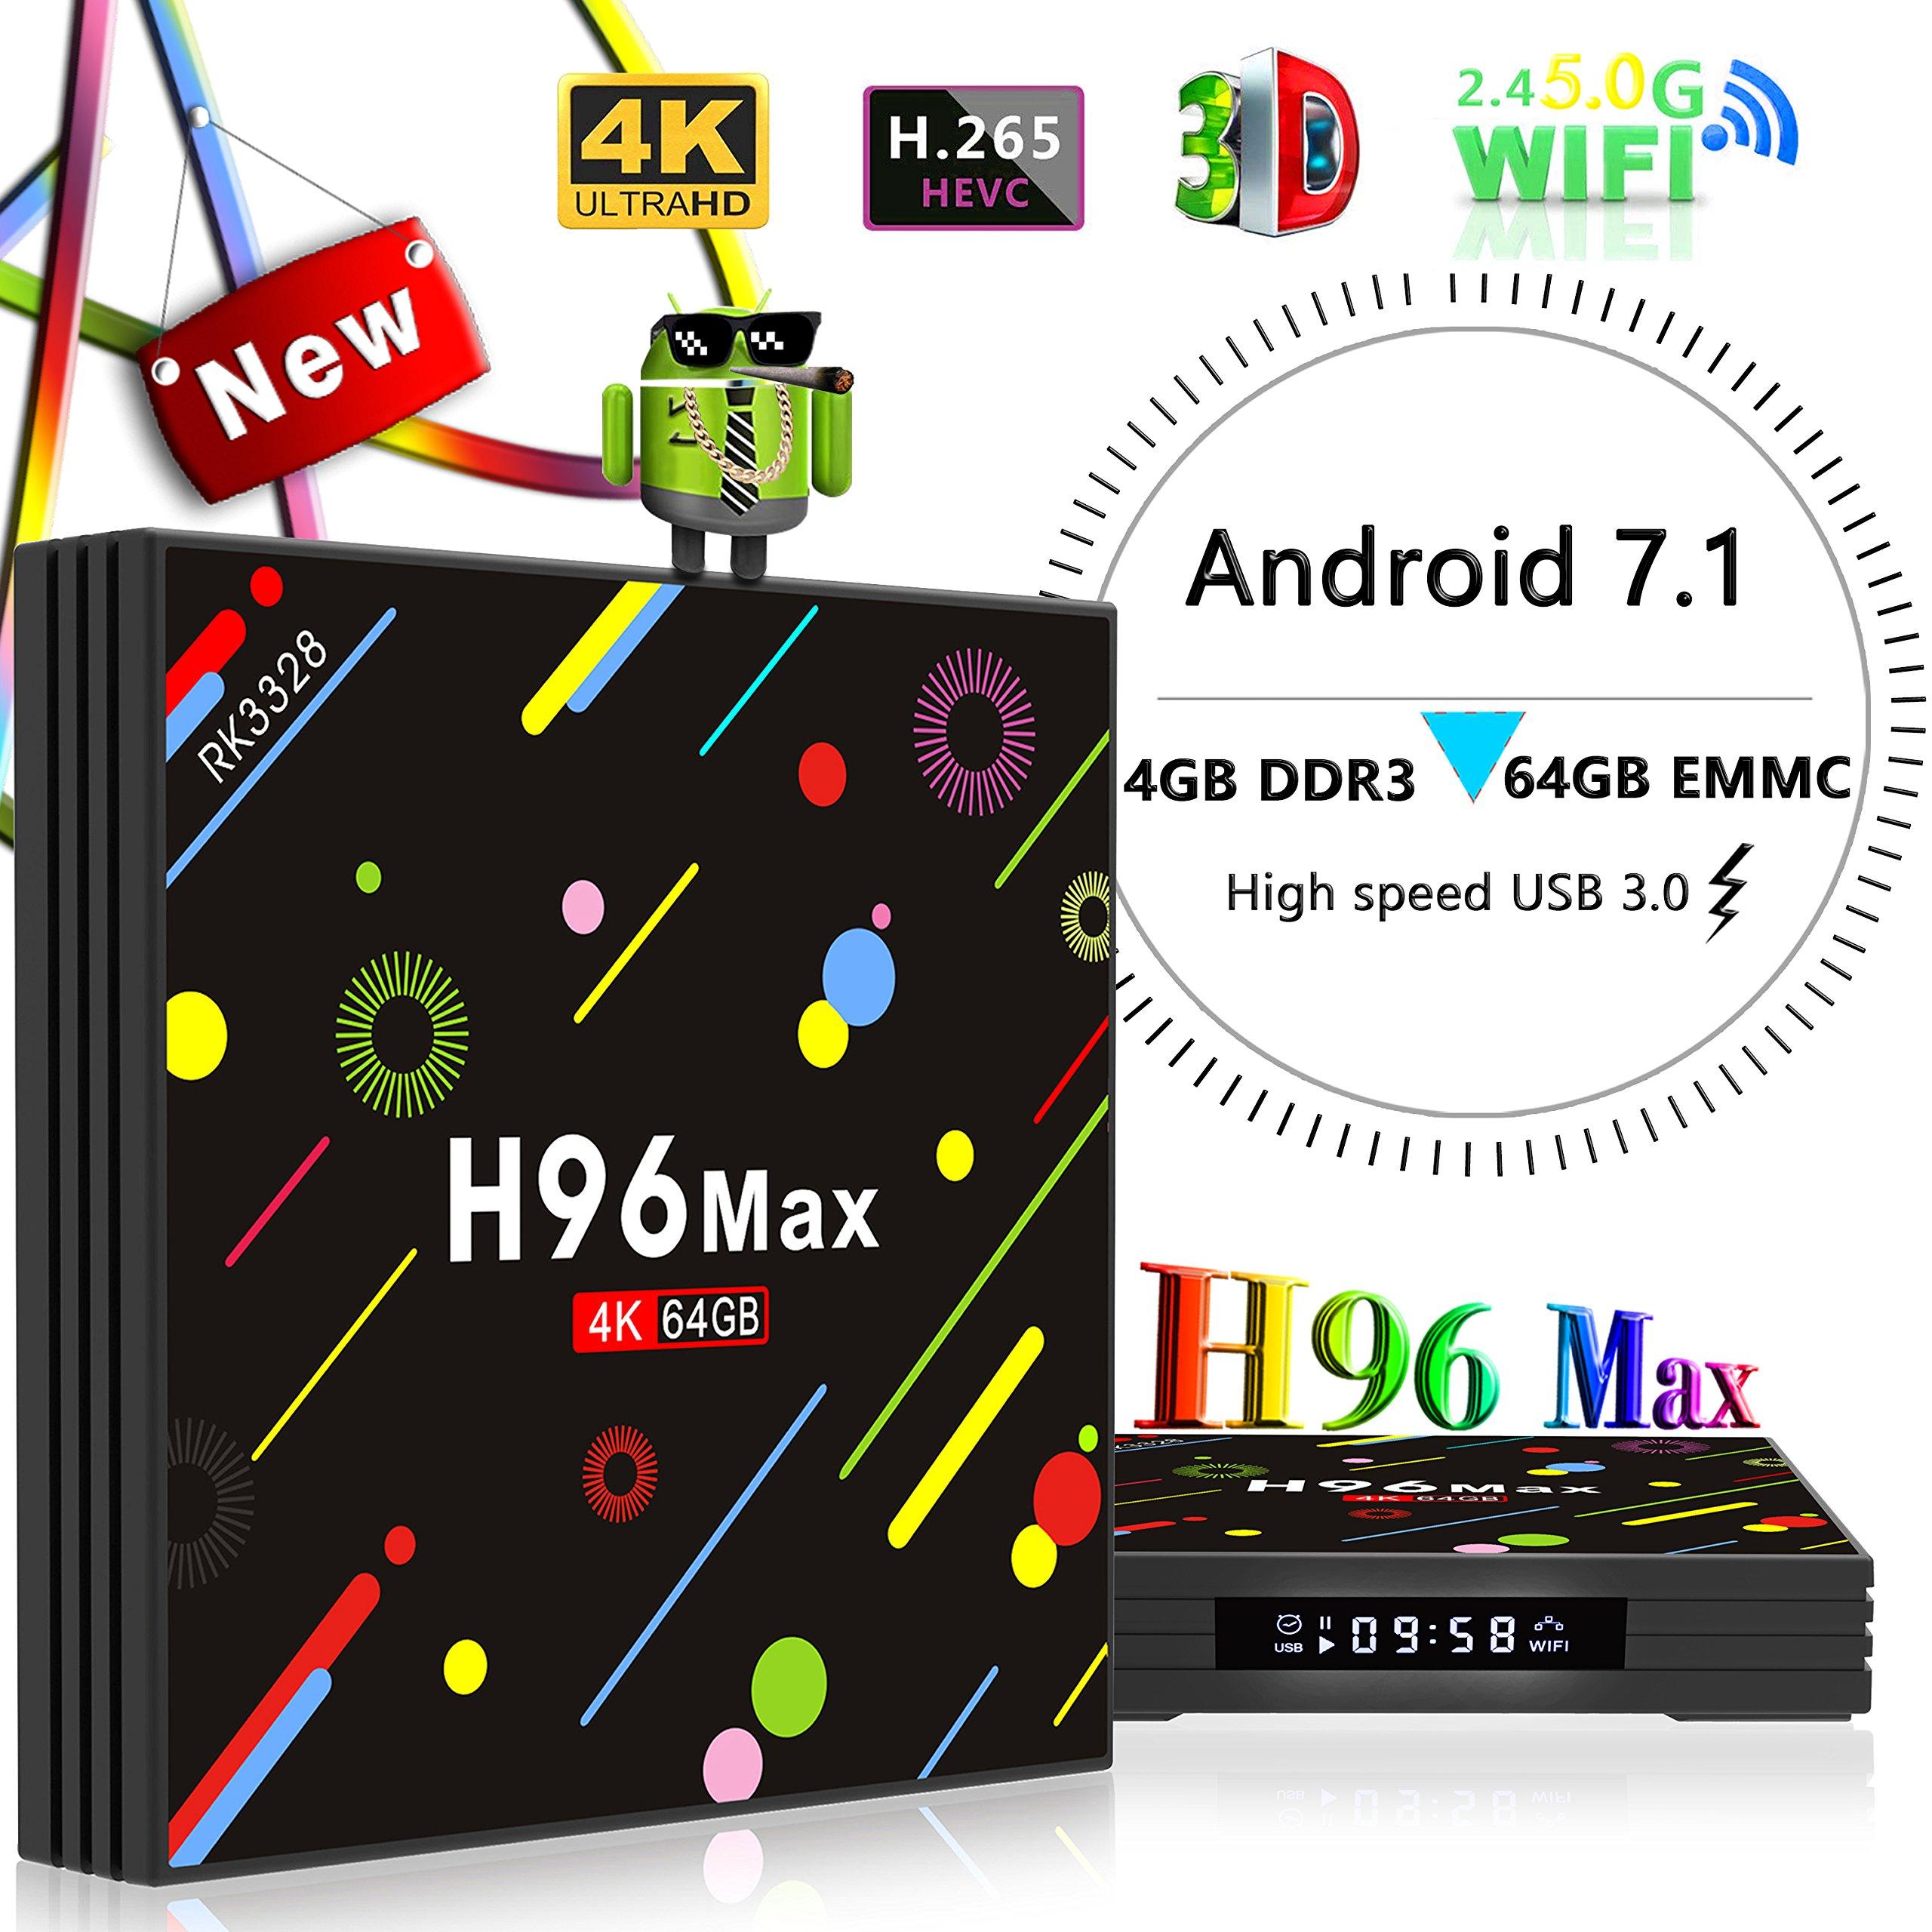 Yongf 4G 64GB TV Box, H96 MAX Android 7.1 tv Box RK3328 Quad-Core 64bit Cortex-A53 4 GB 64G Penta-Core Mali-450 Up to 750Mhz+ Full HD/H.265 / Dual WiFi BT 4.1 Smart Media Player,smart tv box